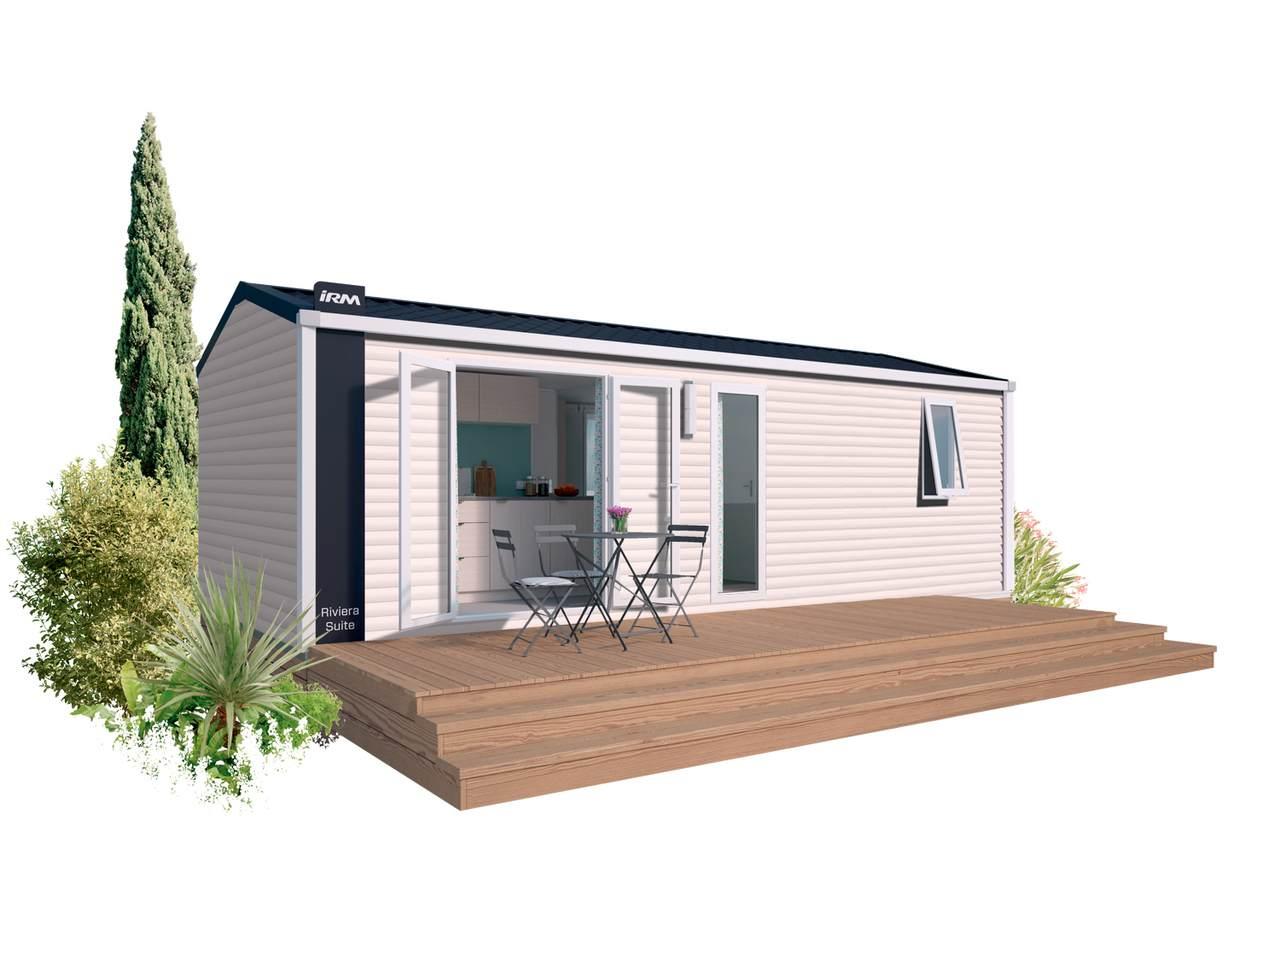 Mobil home RIVIERA SUITE - 2 chambres pour professionnel | IRM